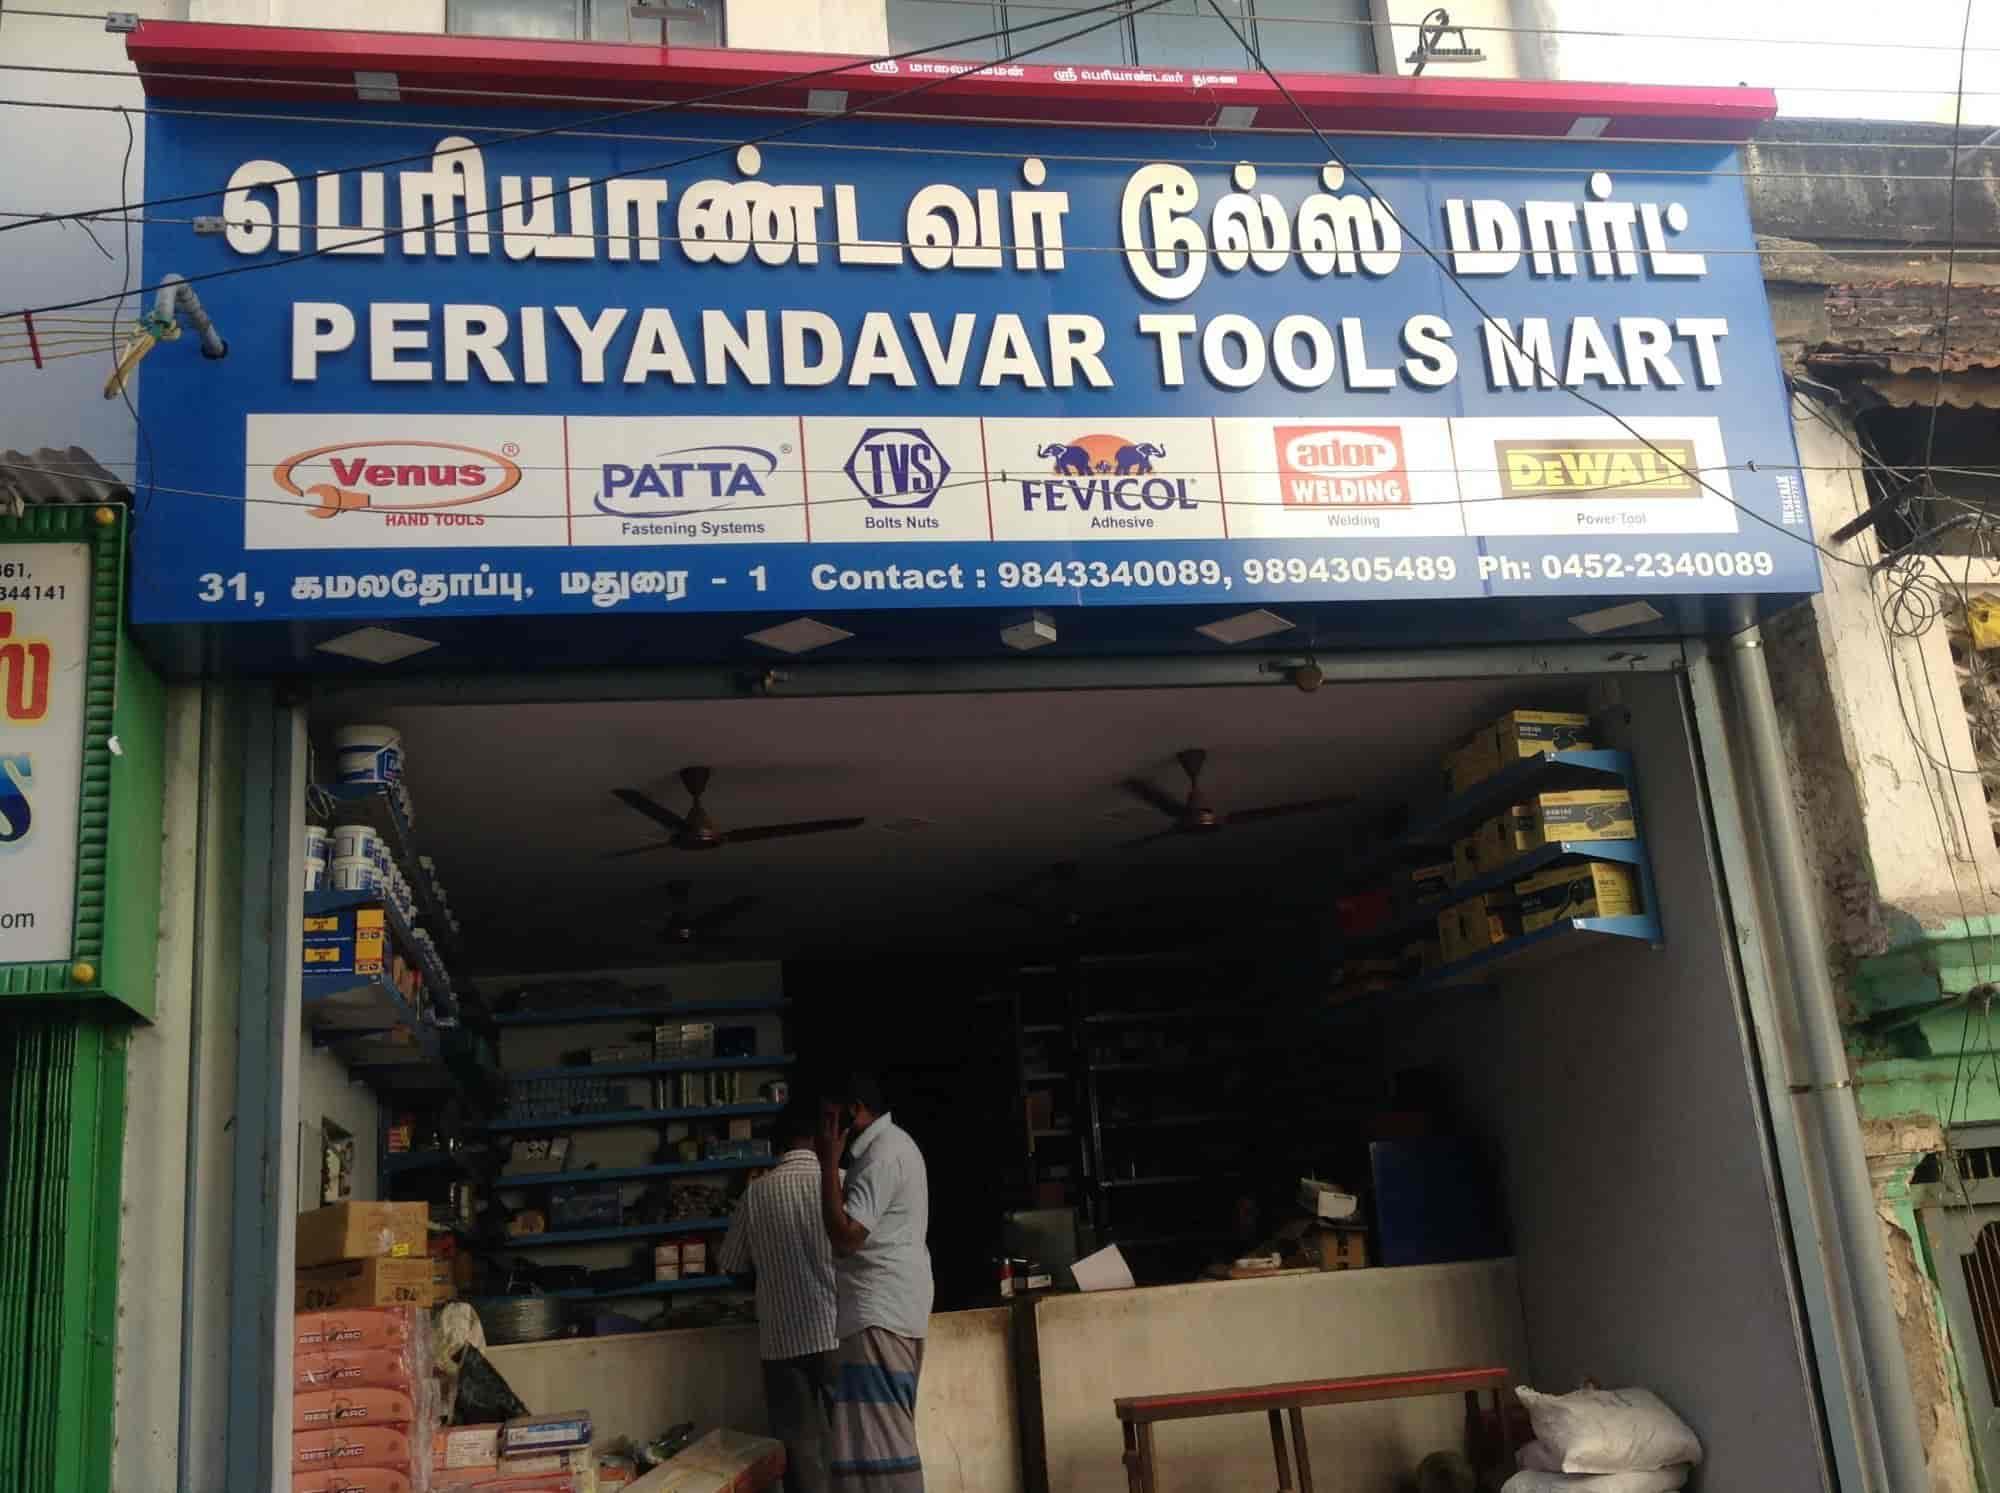 Periyandavar tools mart simmakkal hardware shops in madurai periyandavar tools mart simmakkal hardware shops in madurai justdial solutioingenieria Images